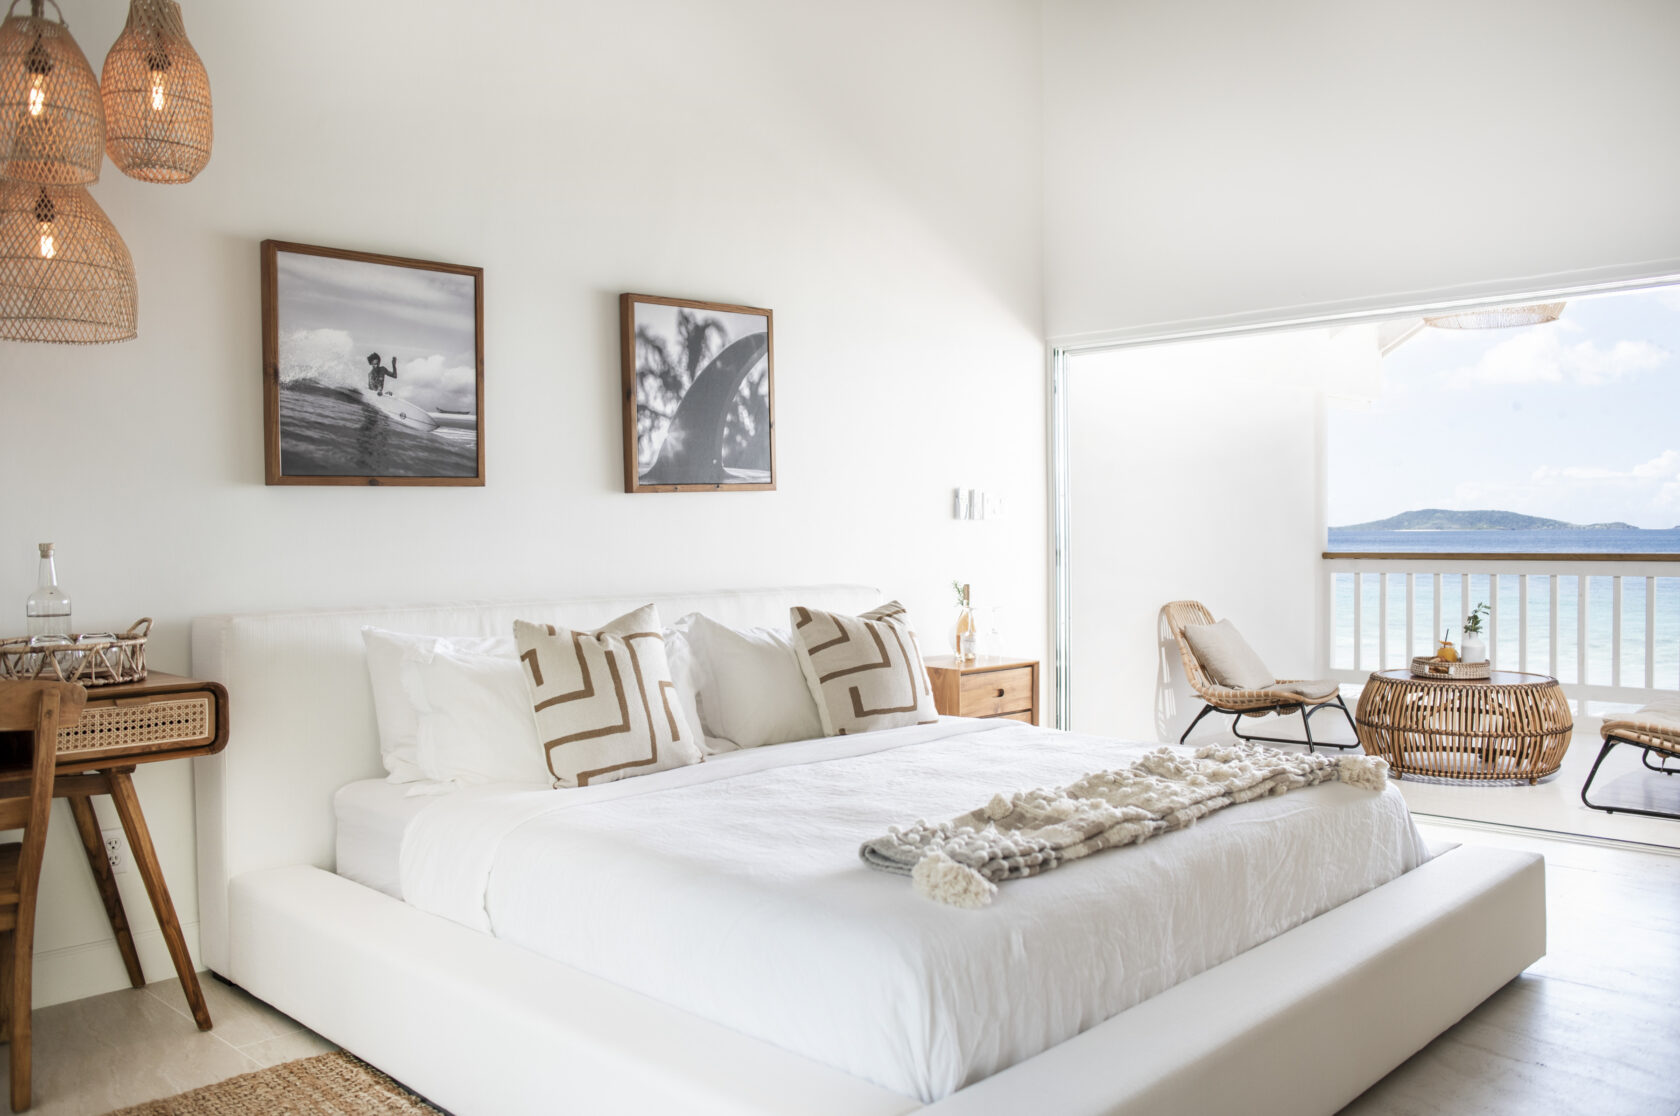 Bedroom with an ocean view